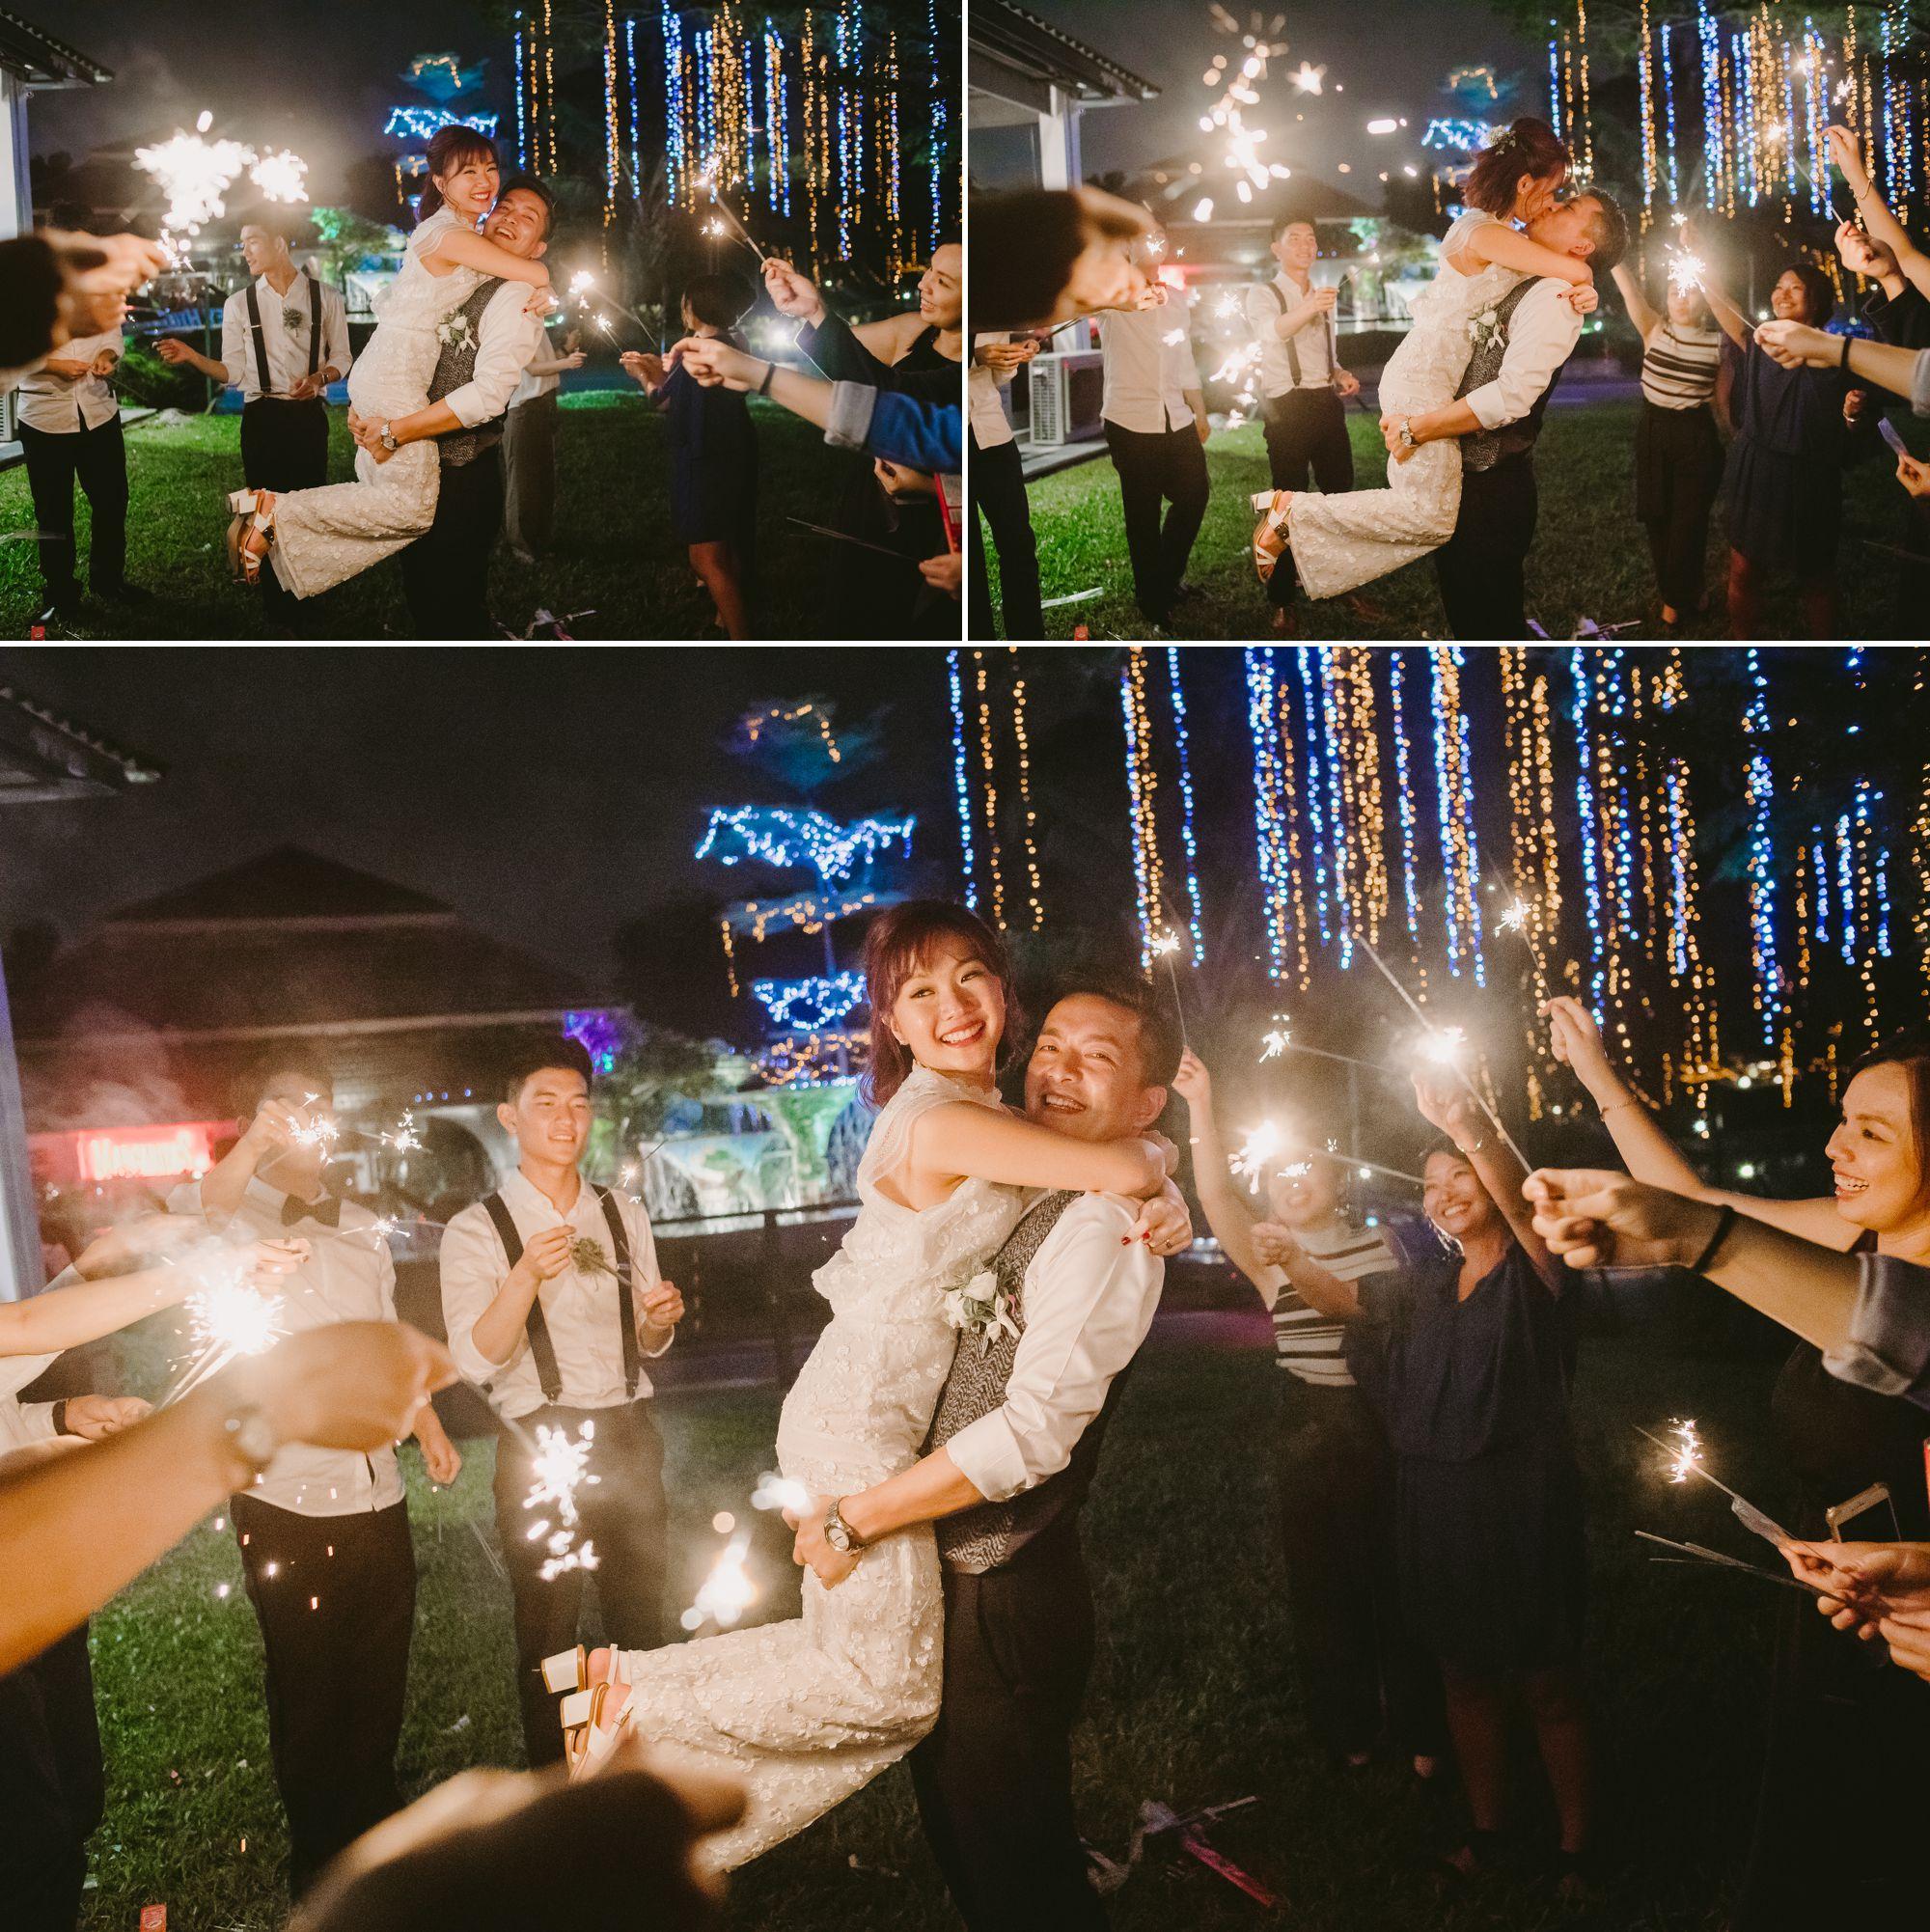 wedding_photography 42.jpg